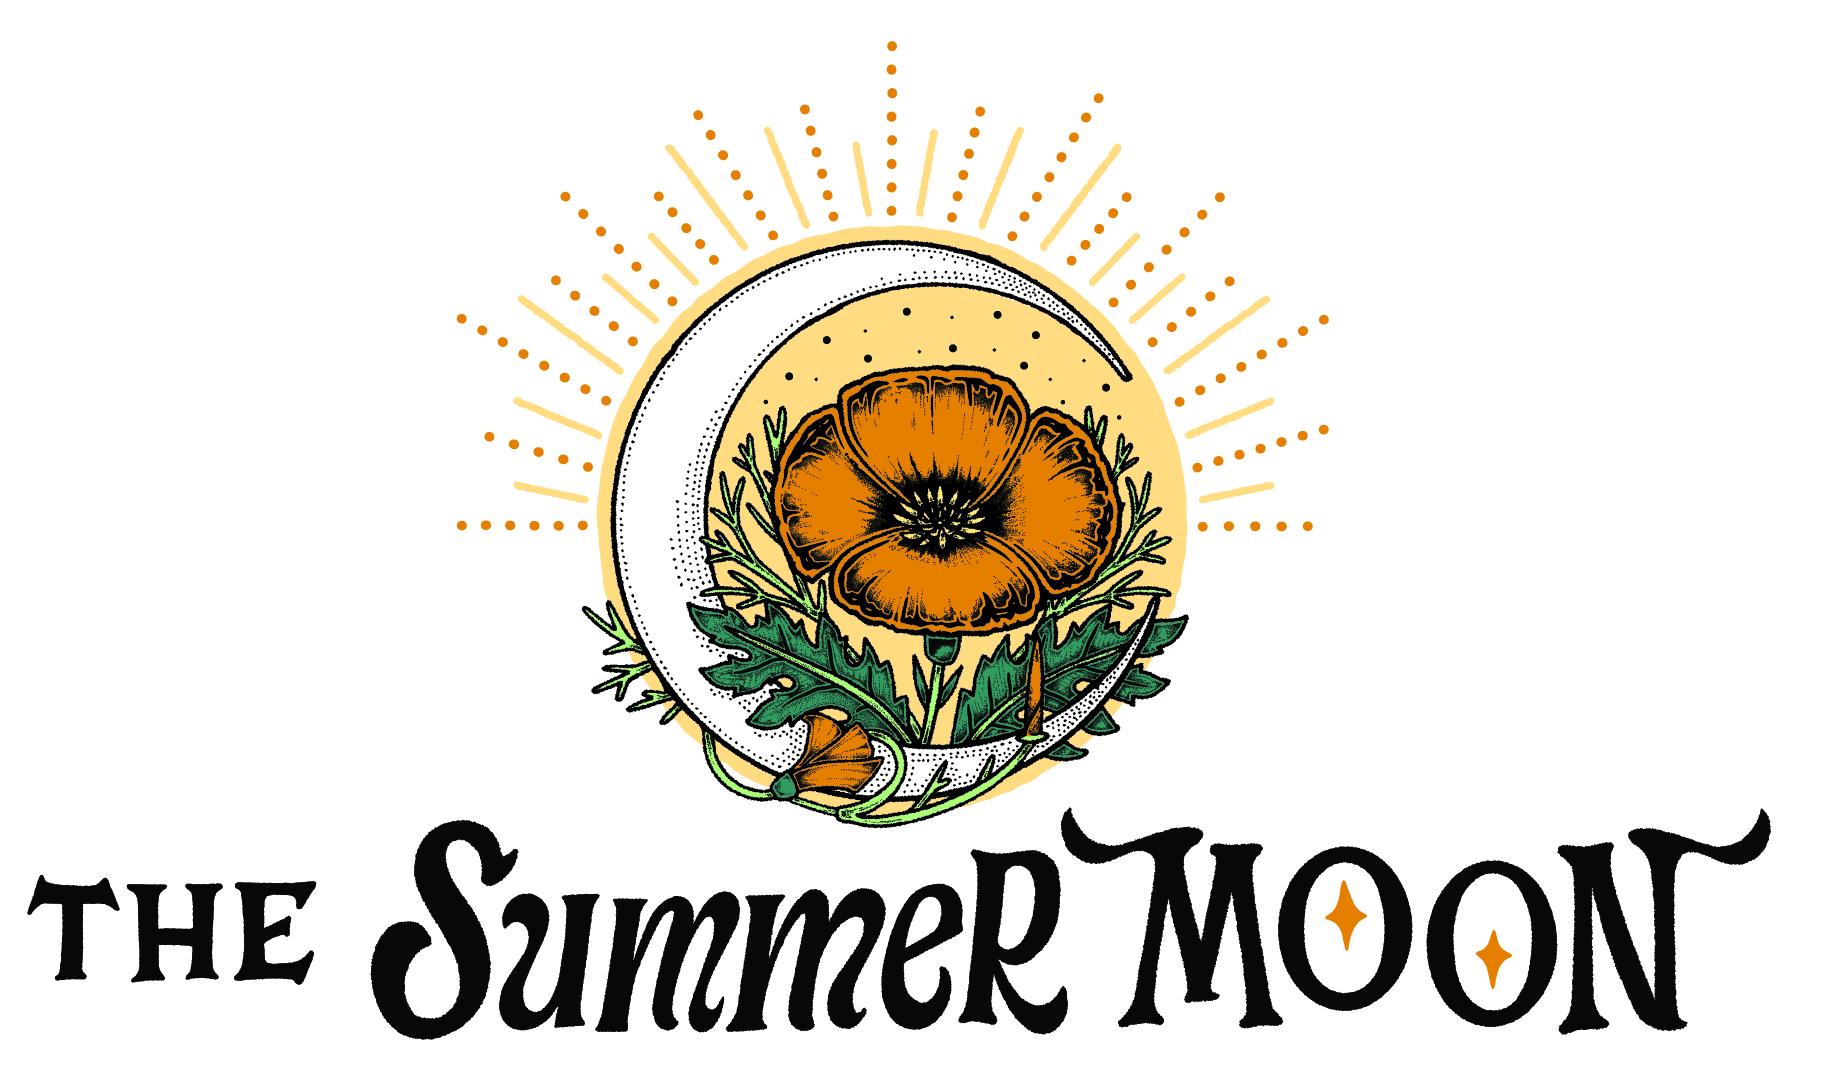 The Summer Moon